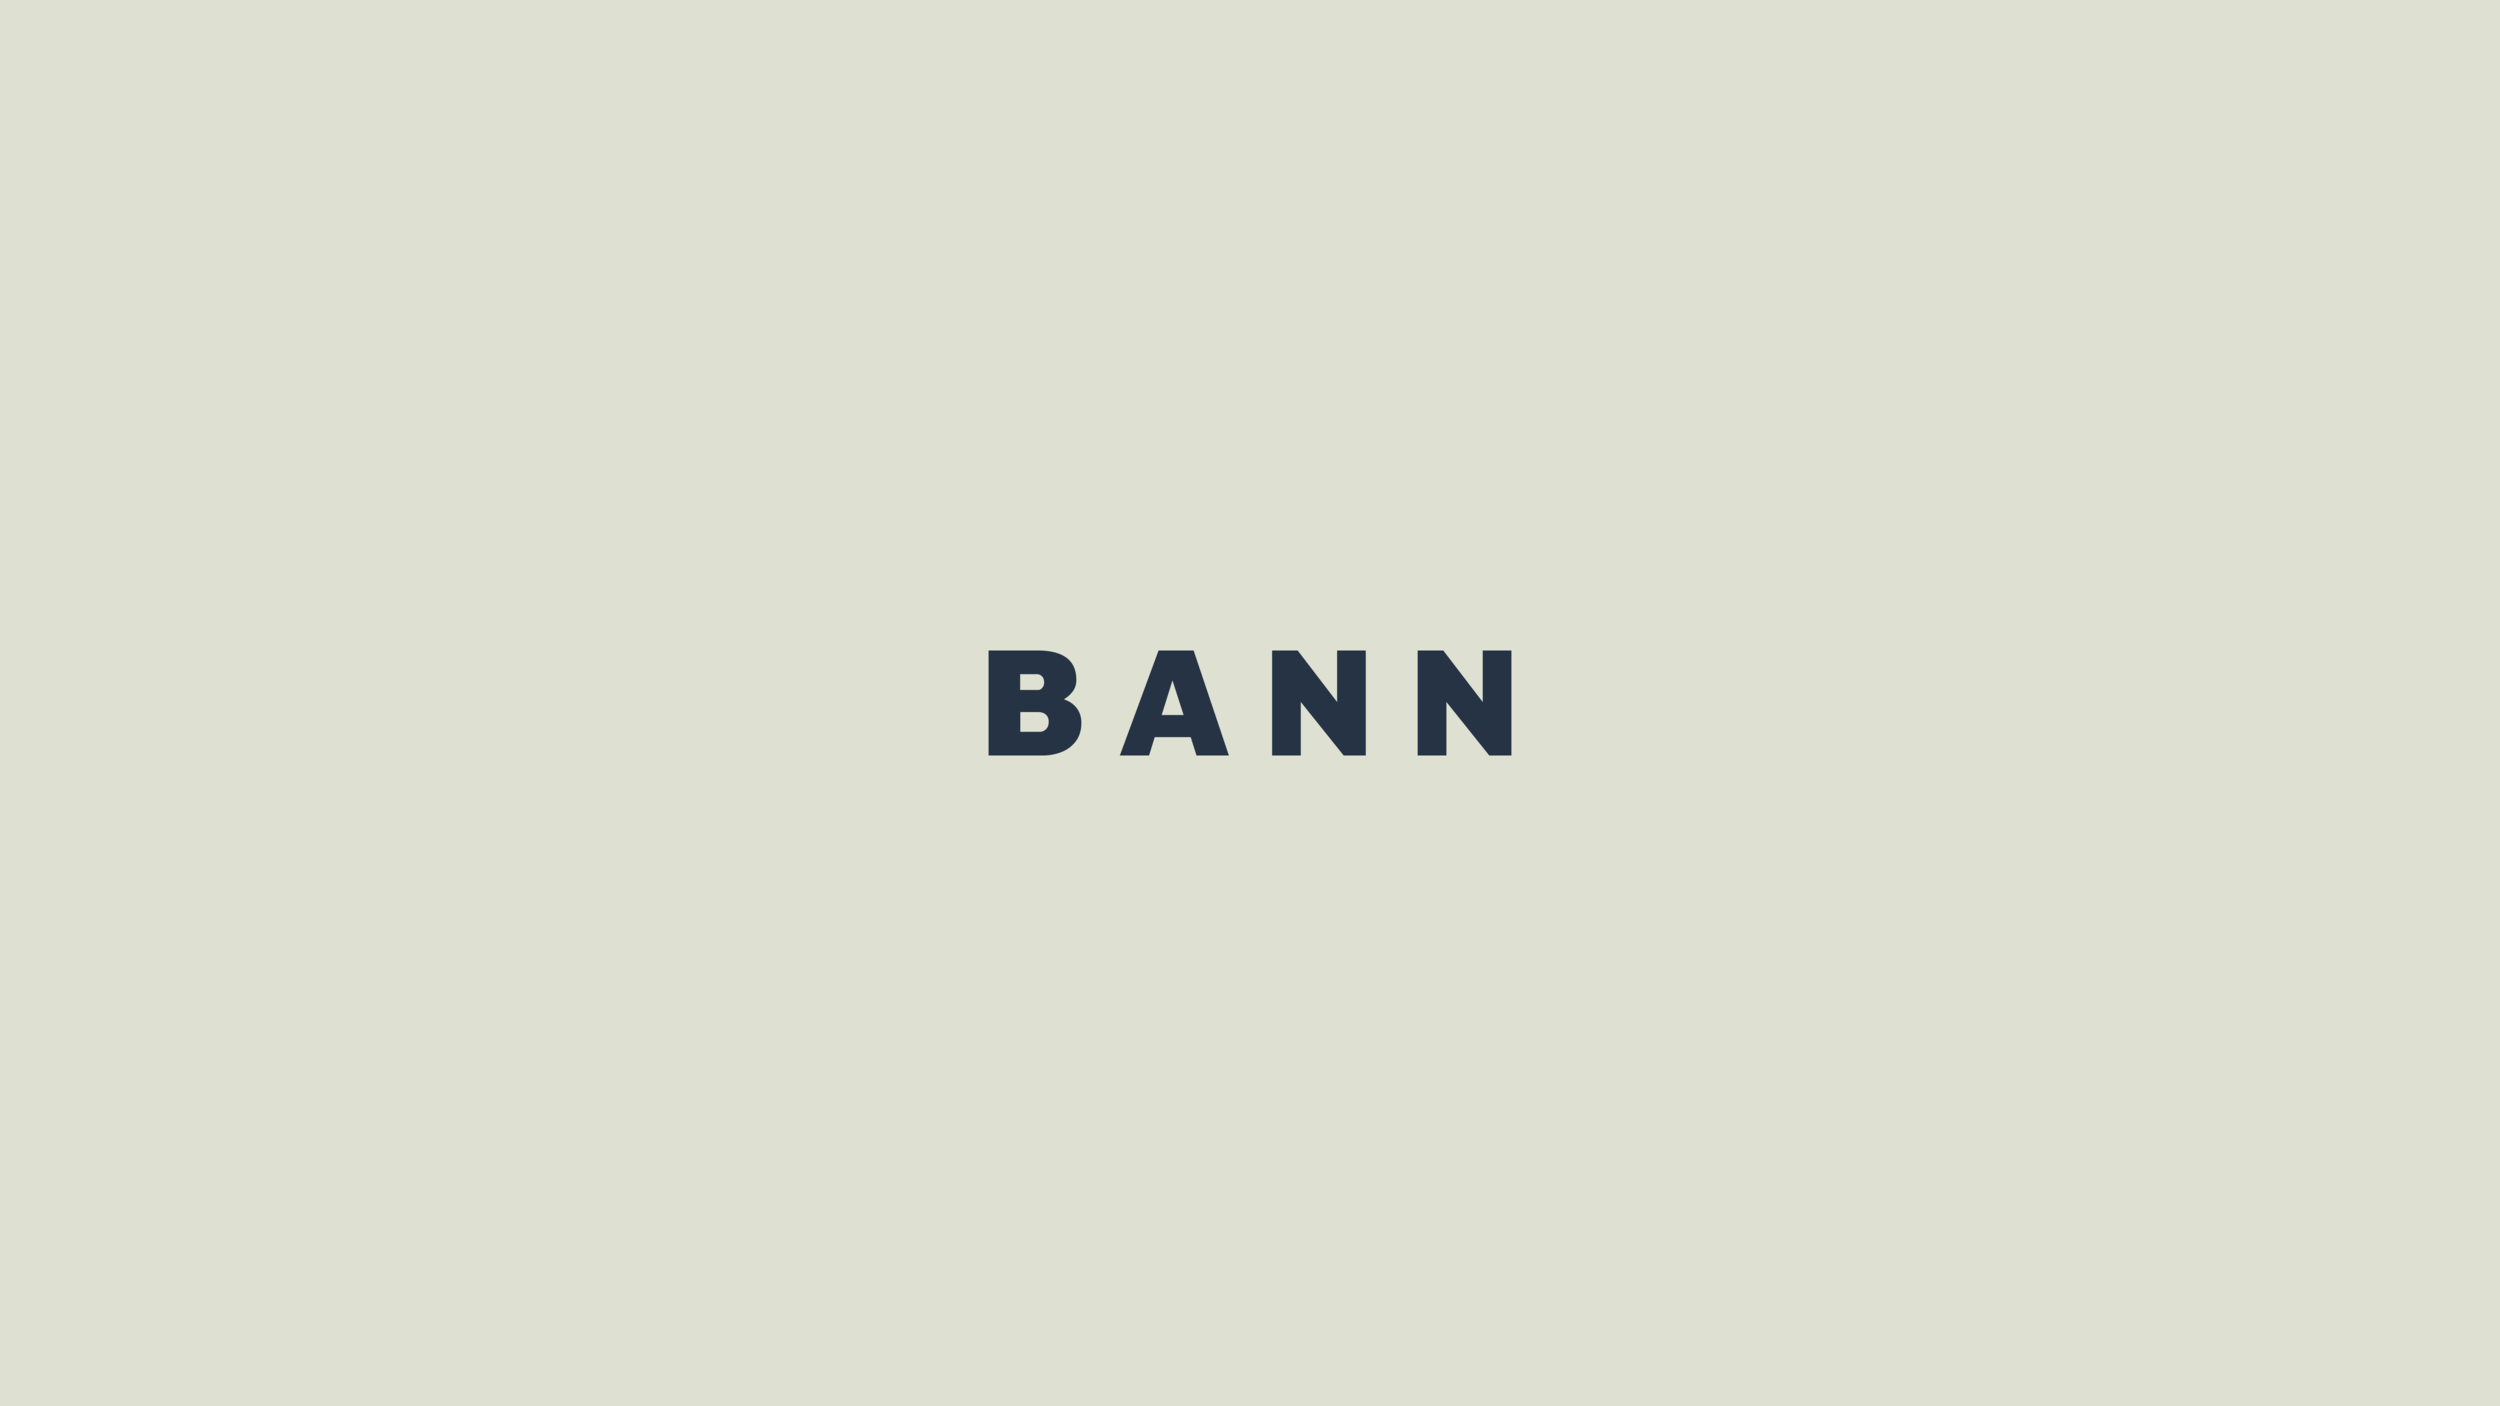 Assets-Website-Portfolio-BANN-Logo-01.png